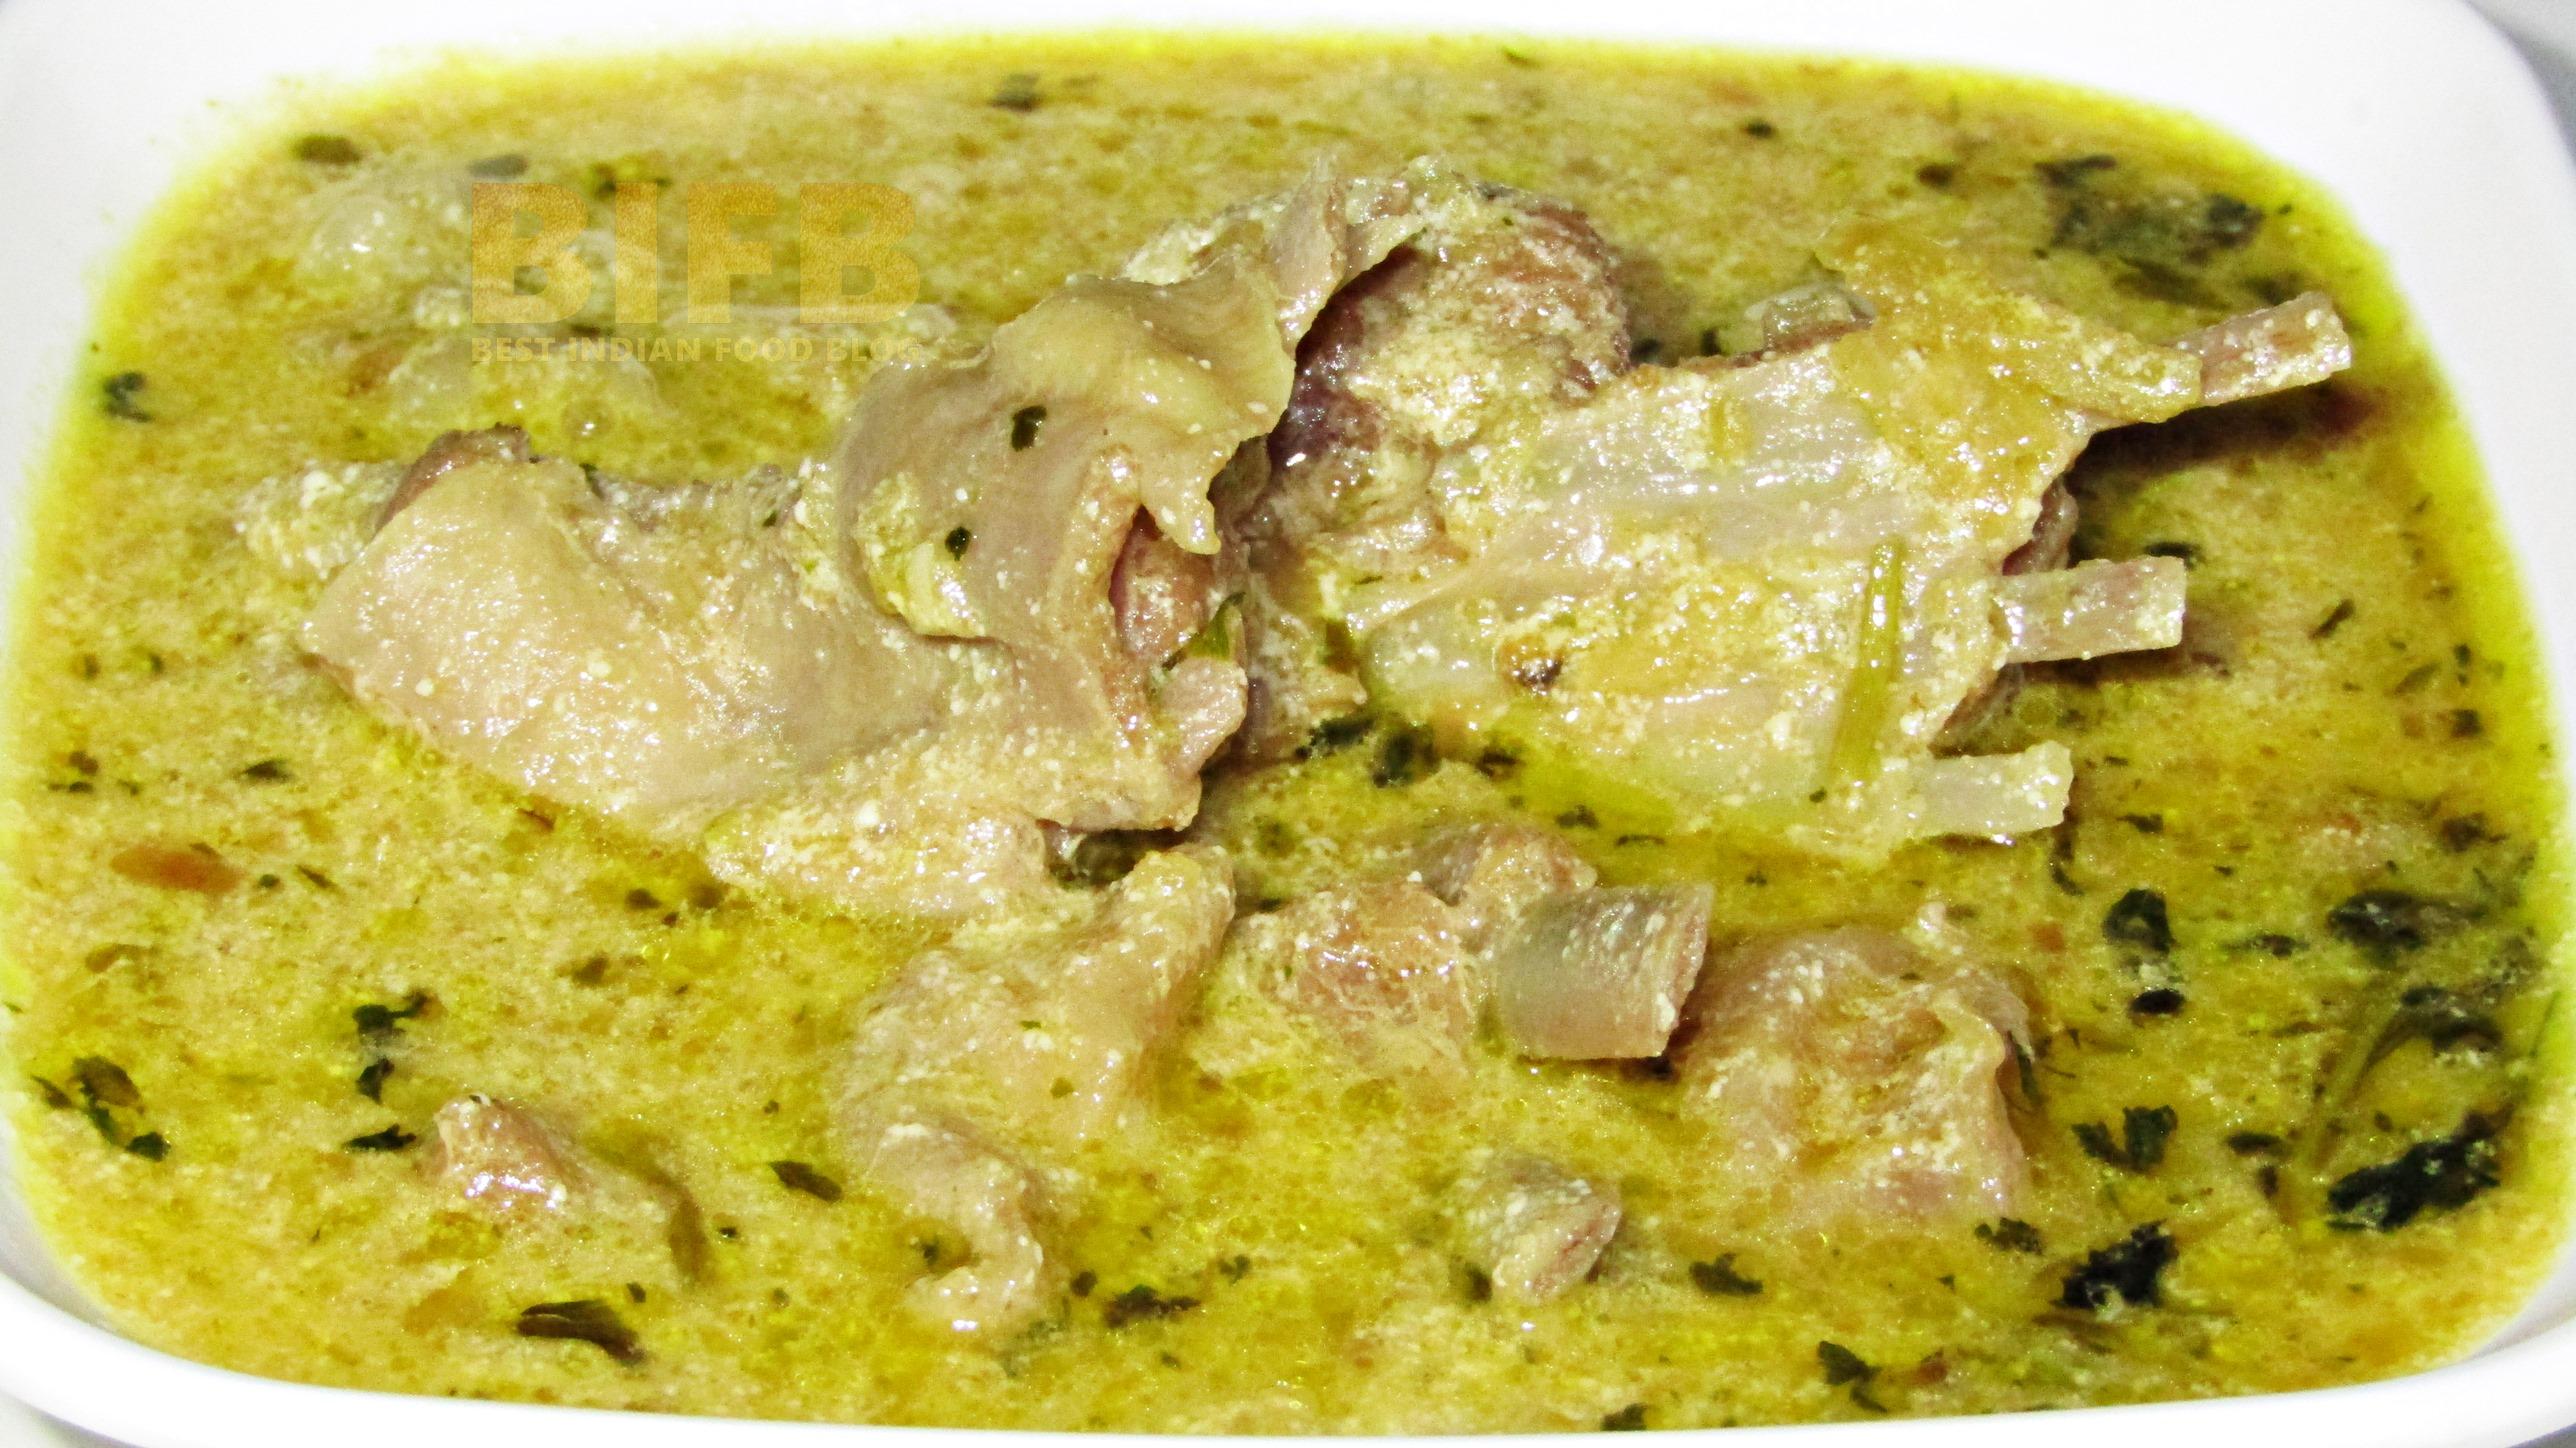 Yakhni from Jammu and Kashmir, India | Best Indian Food Blog | Mutton Yogurt recipe